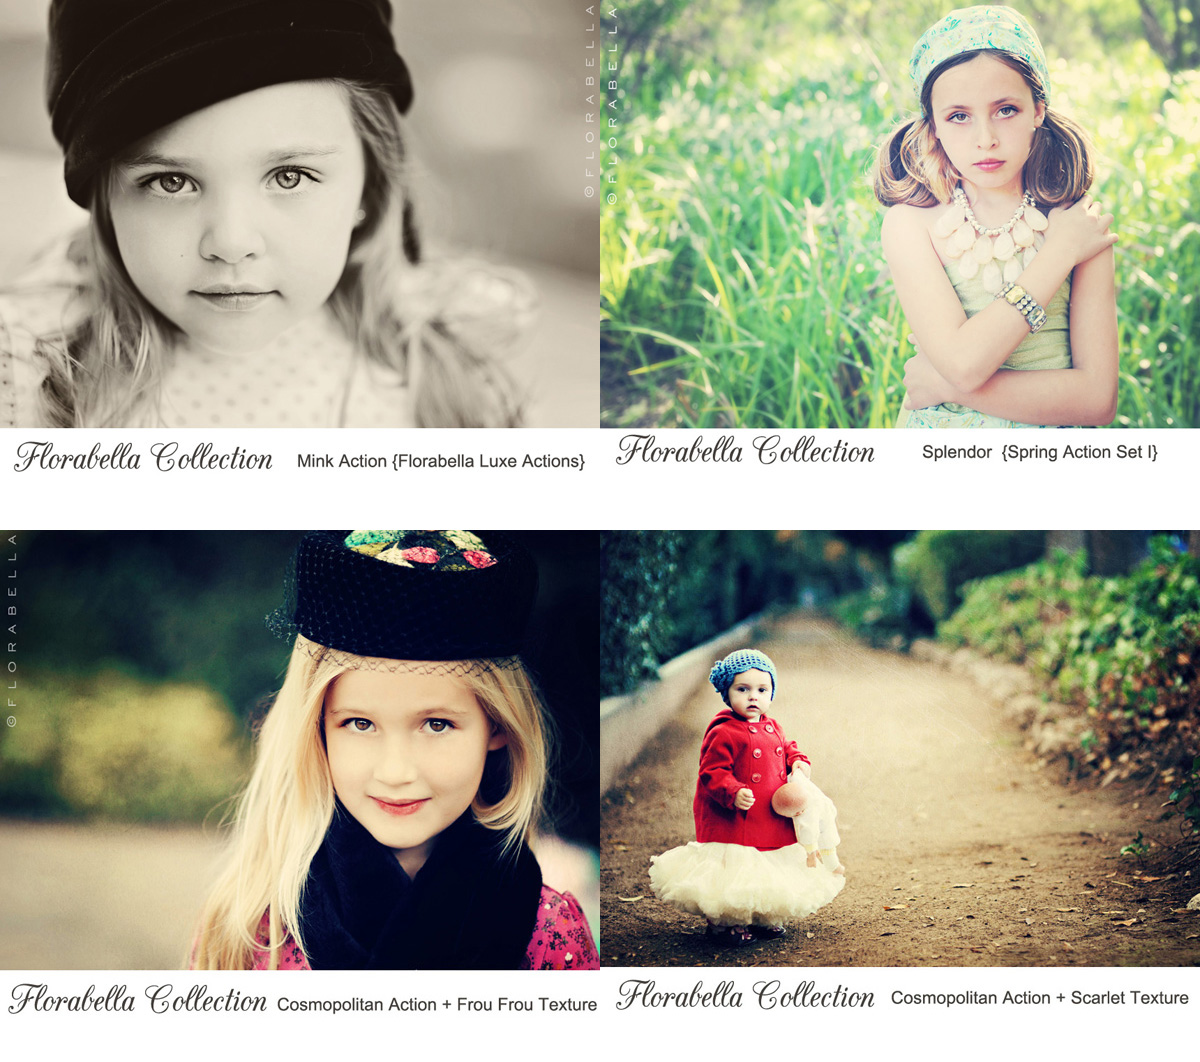 http://2.bp.blogspot.com/_8uhdwoas9dc/TI7dl97yJdI/AAAAAAAAAKk/uIcfYaJGM84/s1600/florabella+collage.jpg